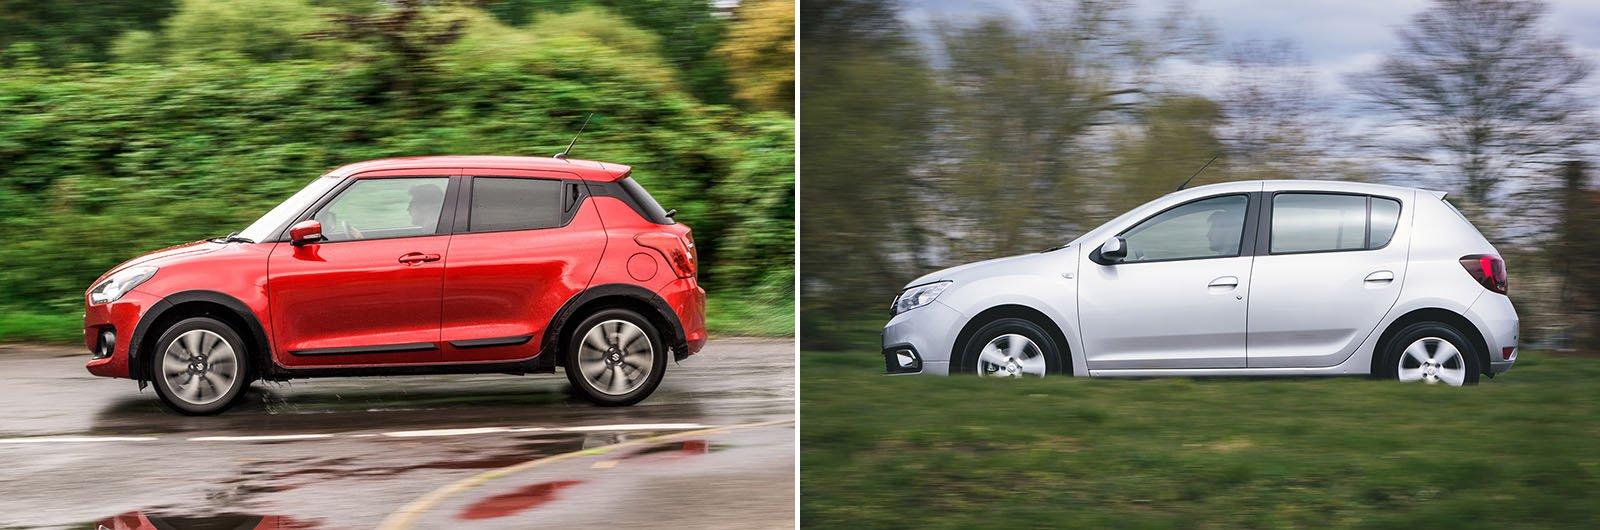 Used Suzuki Swift vs Sandero